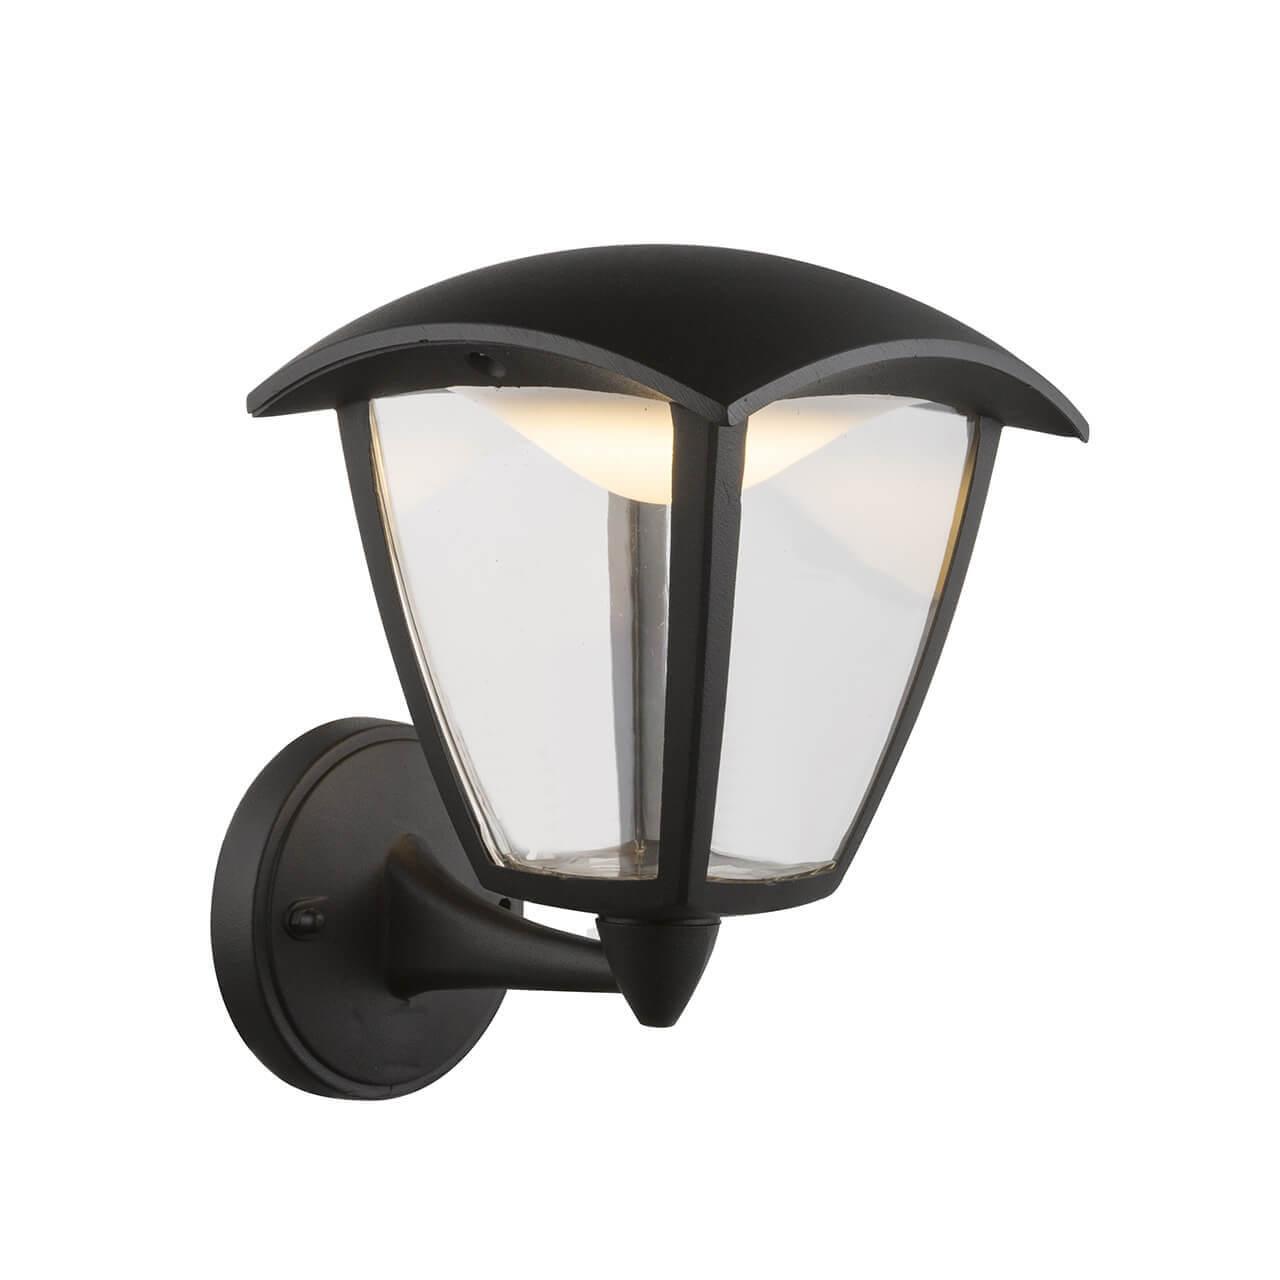 Уличный настенный светодиодный светильник Globo Delio 31825 globo фонарный столб globo delio 31828